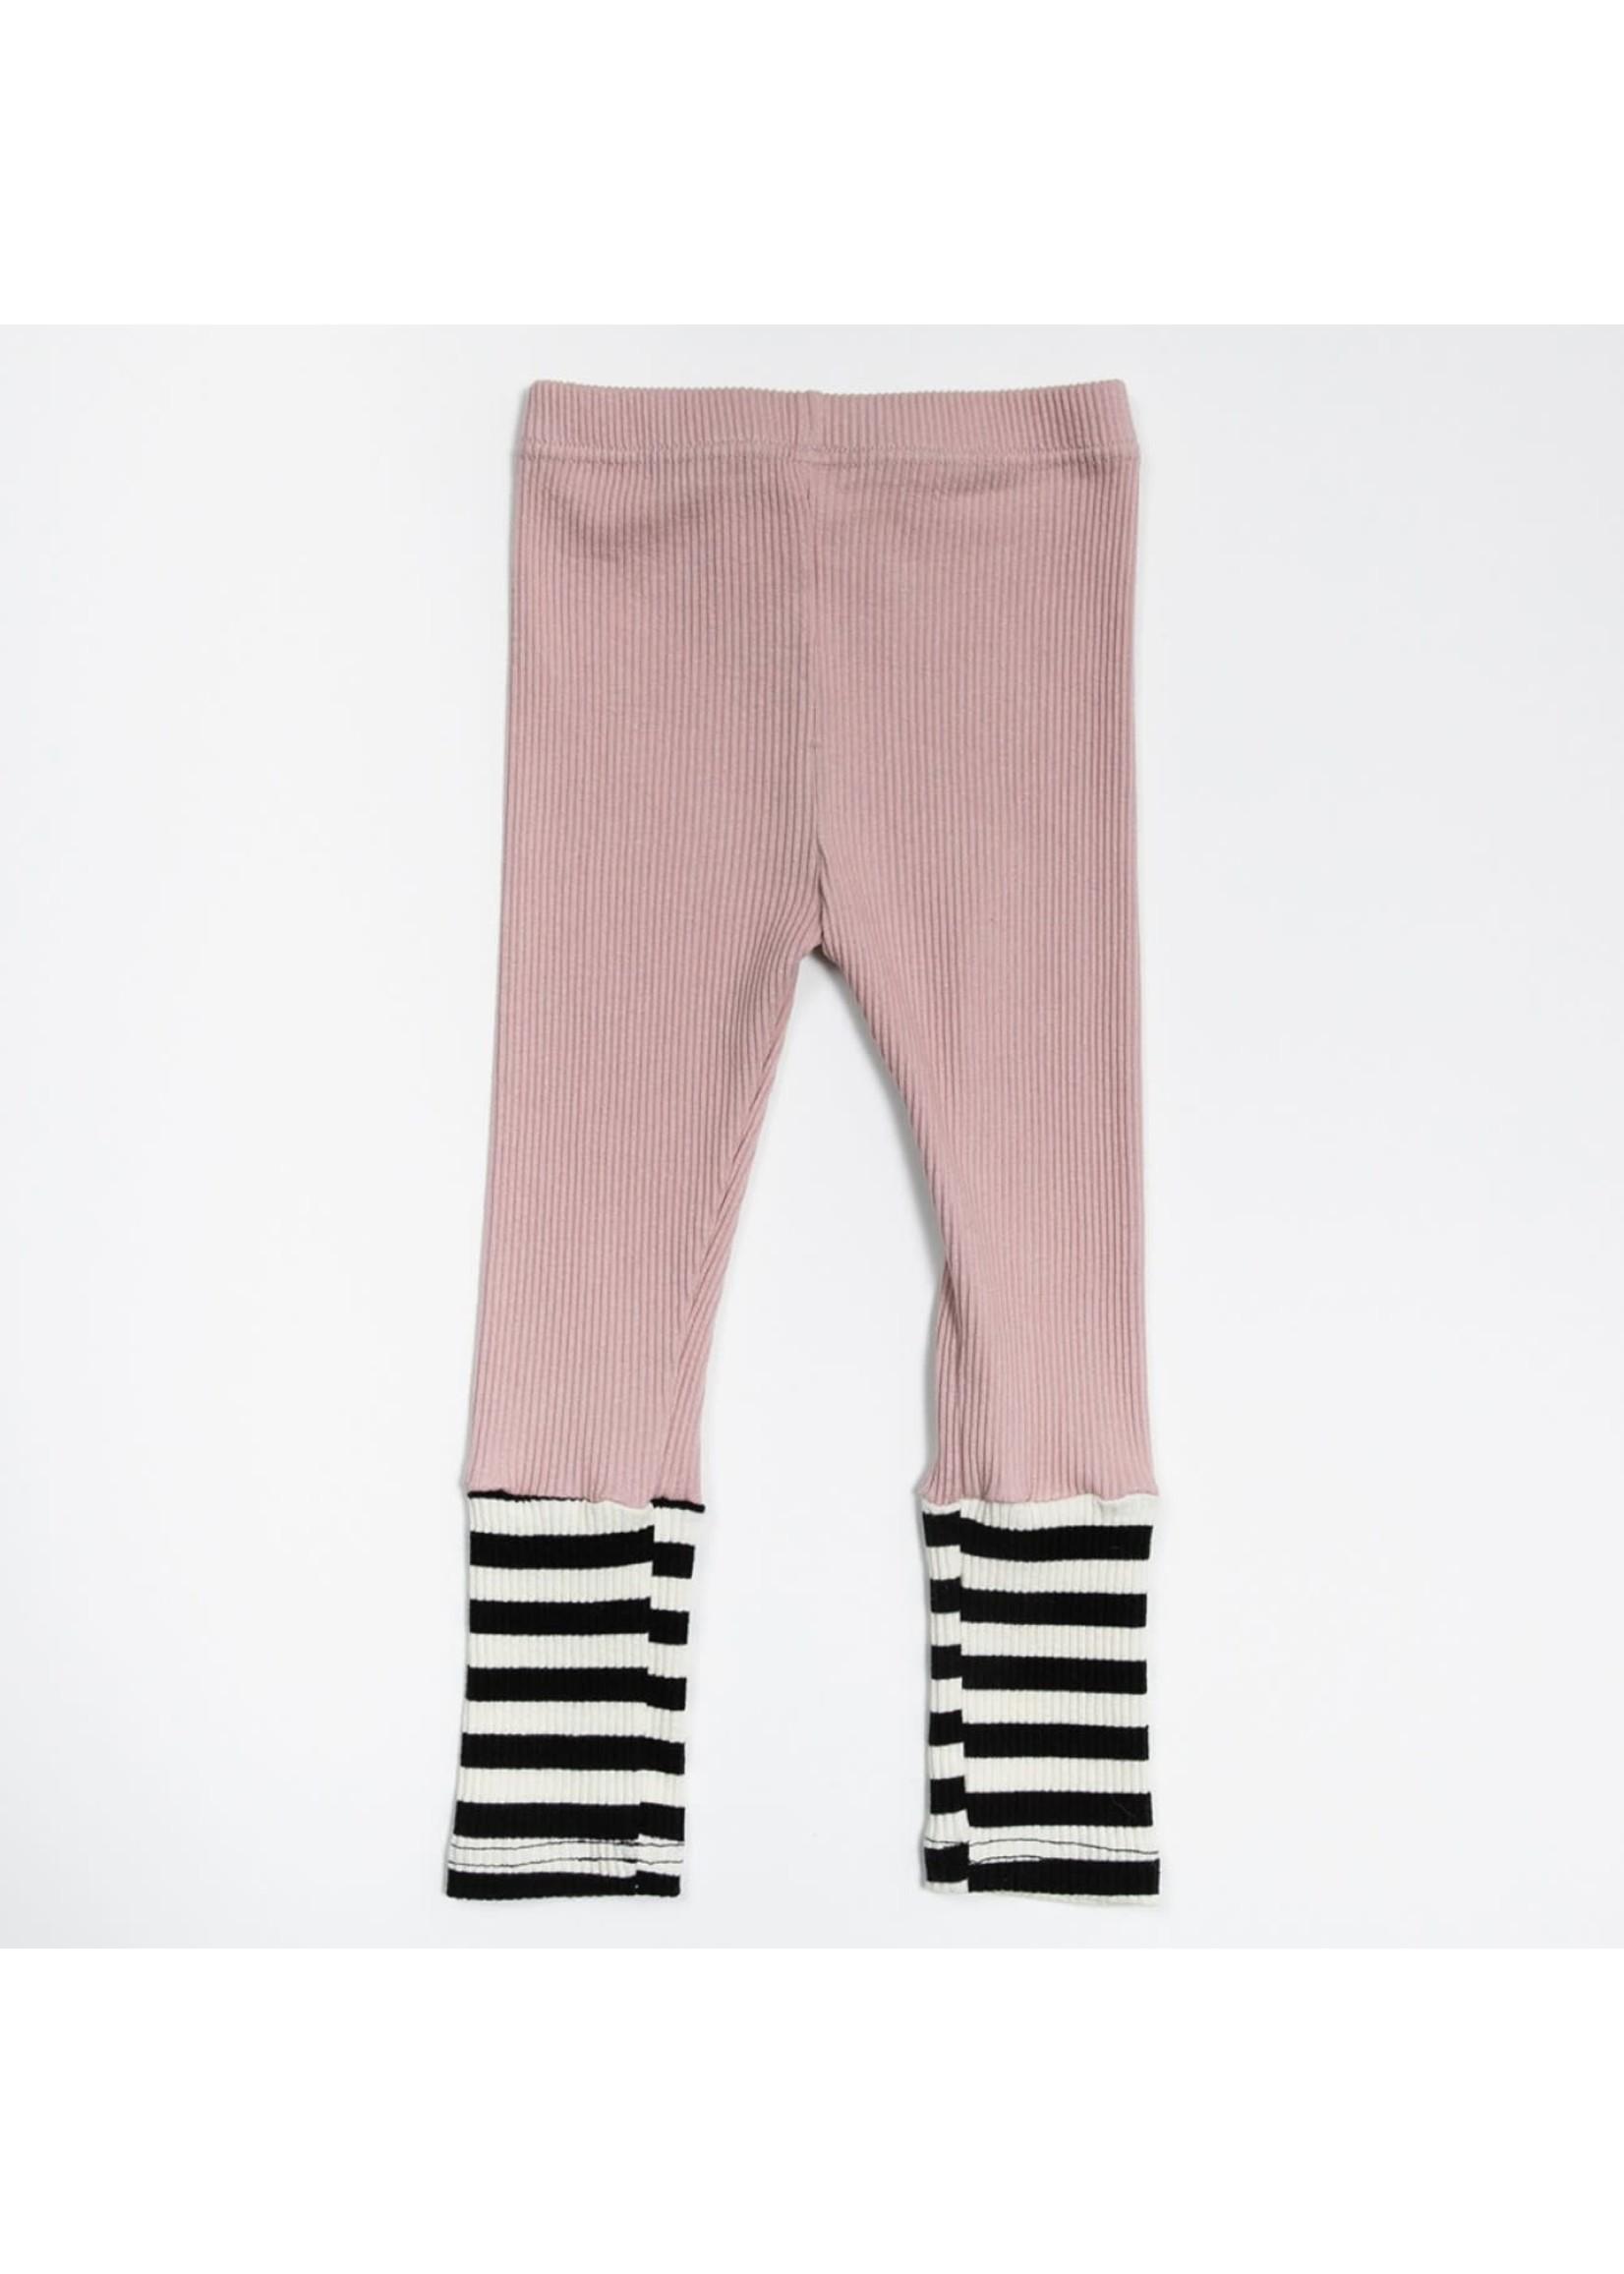 Petite Hailey PH Ava Legging (Pink)